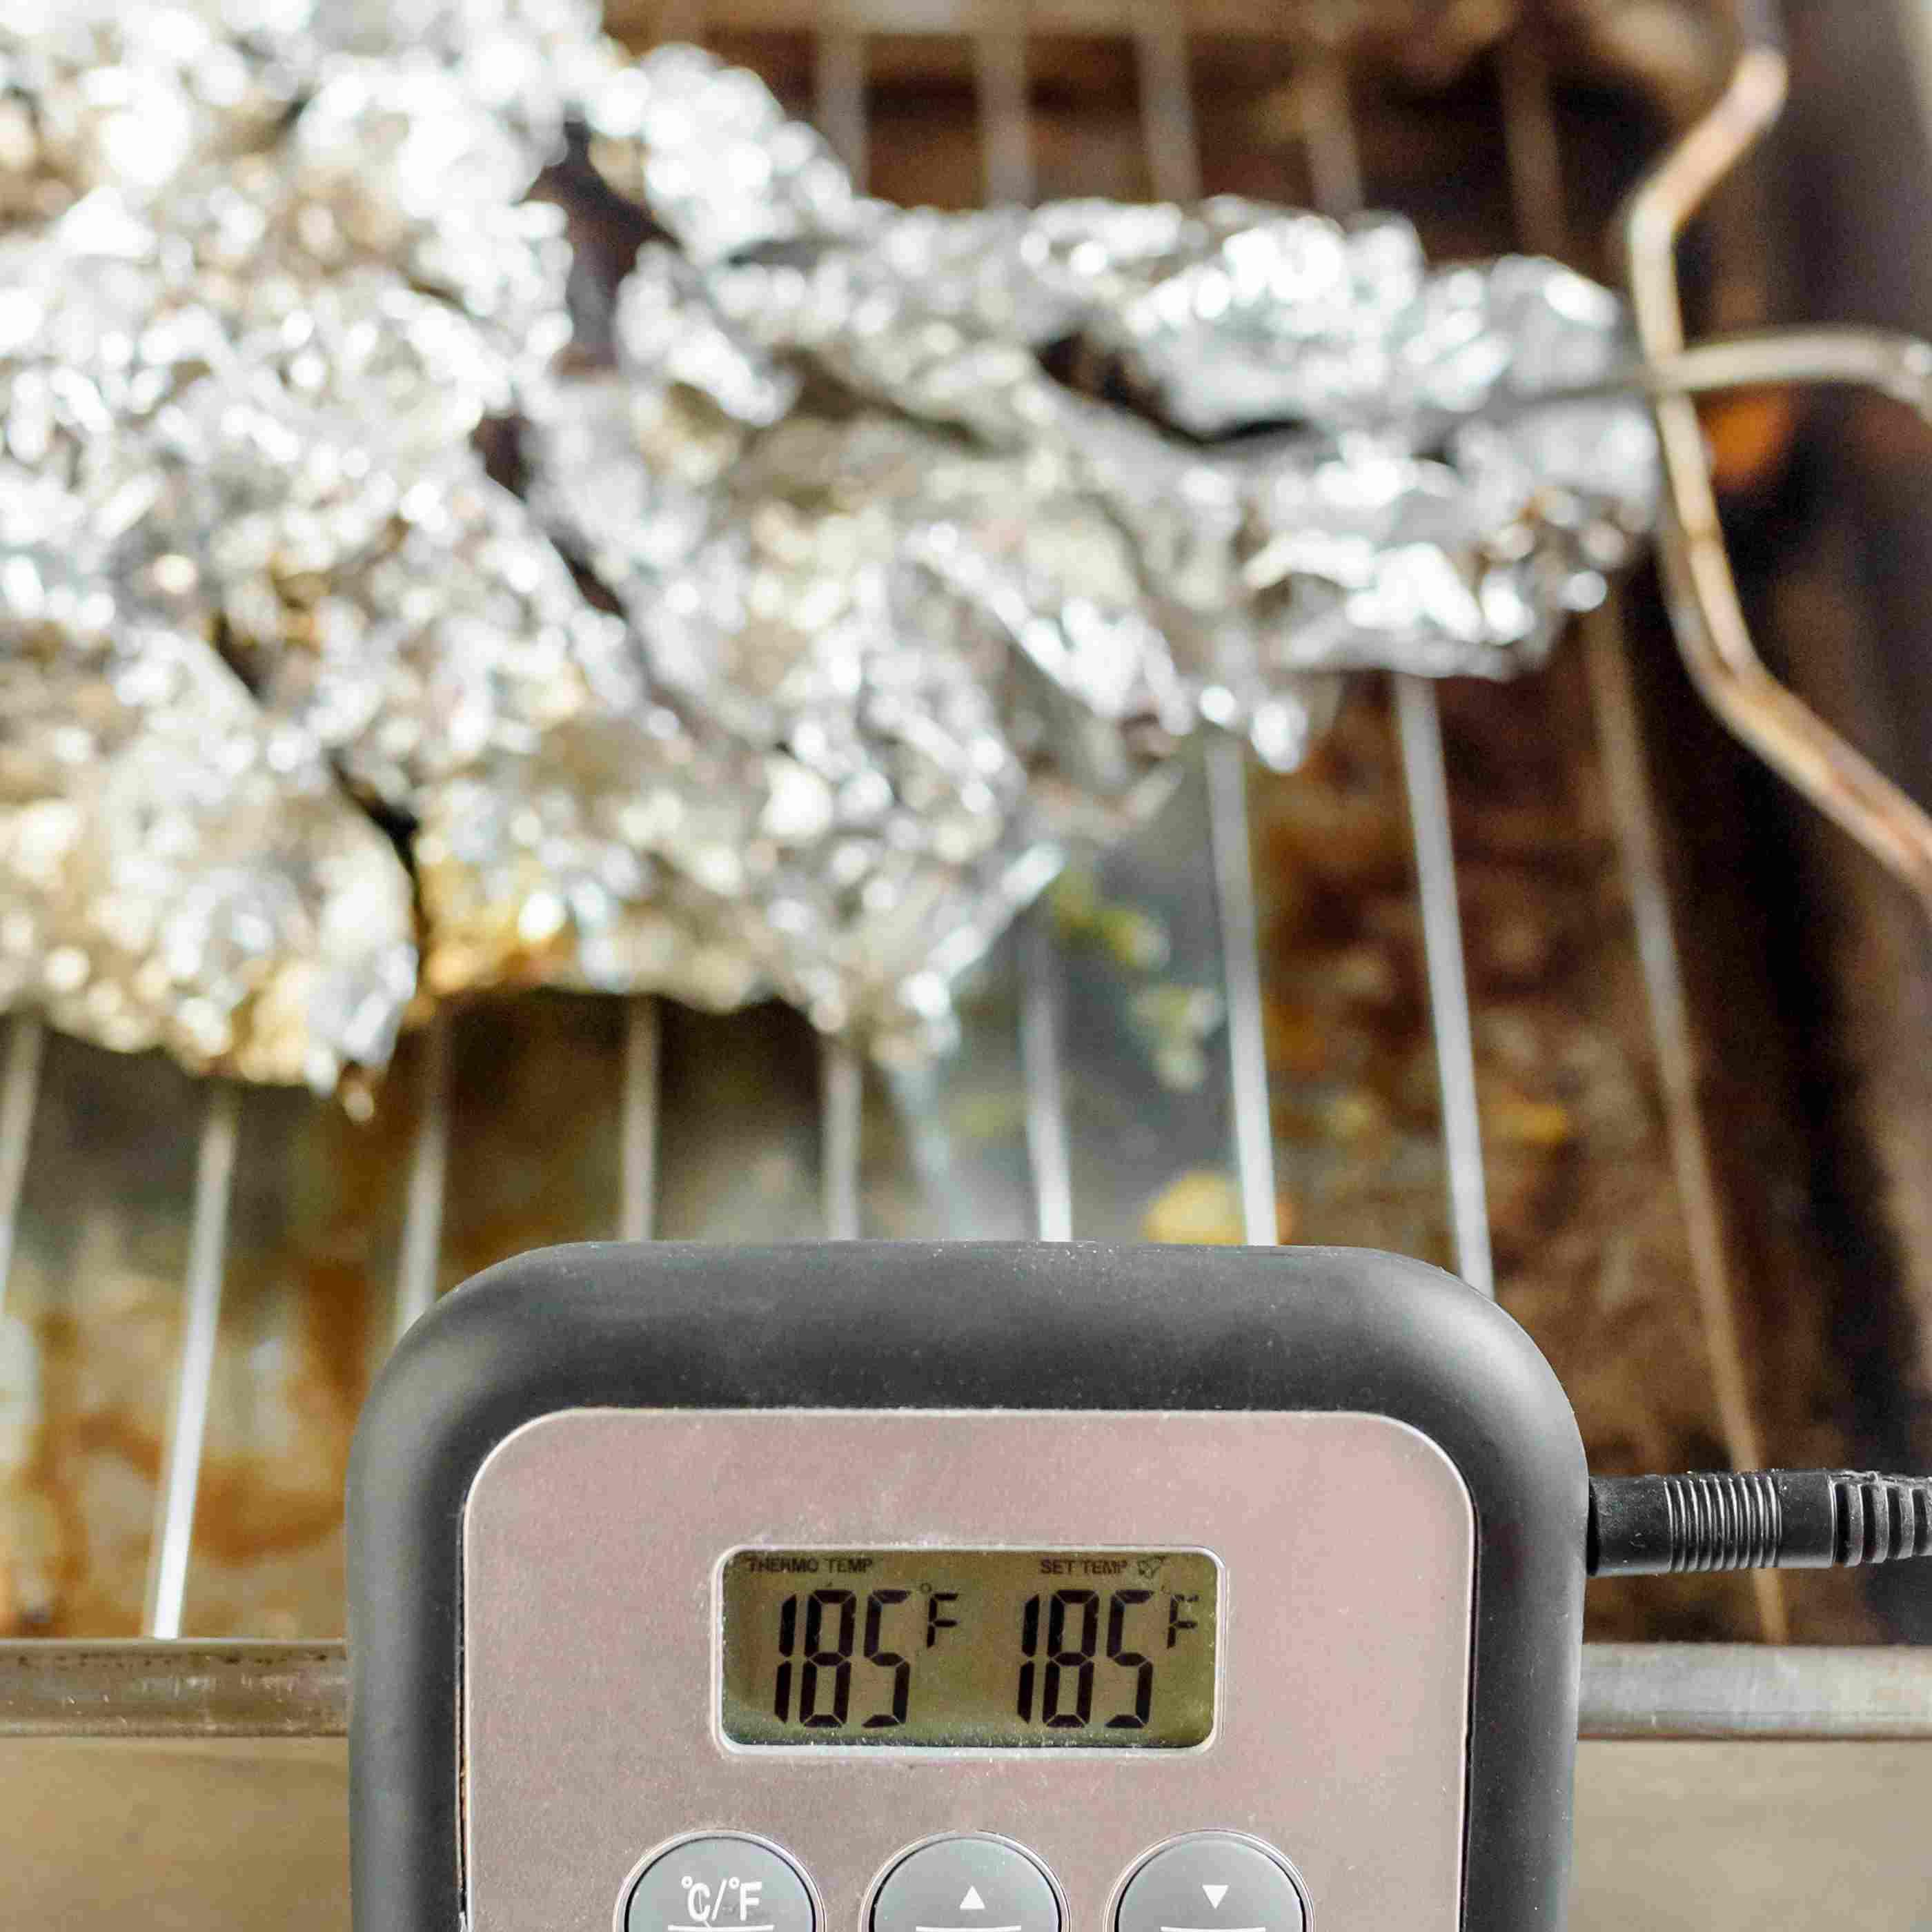 check meat temperature